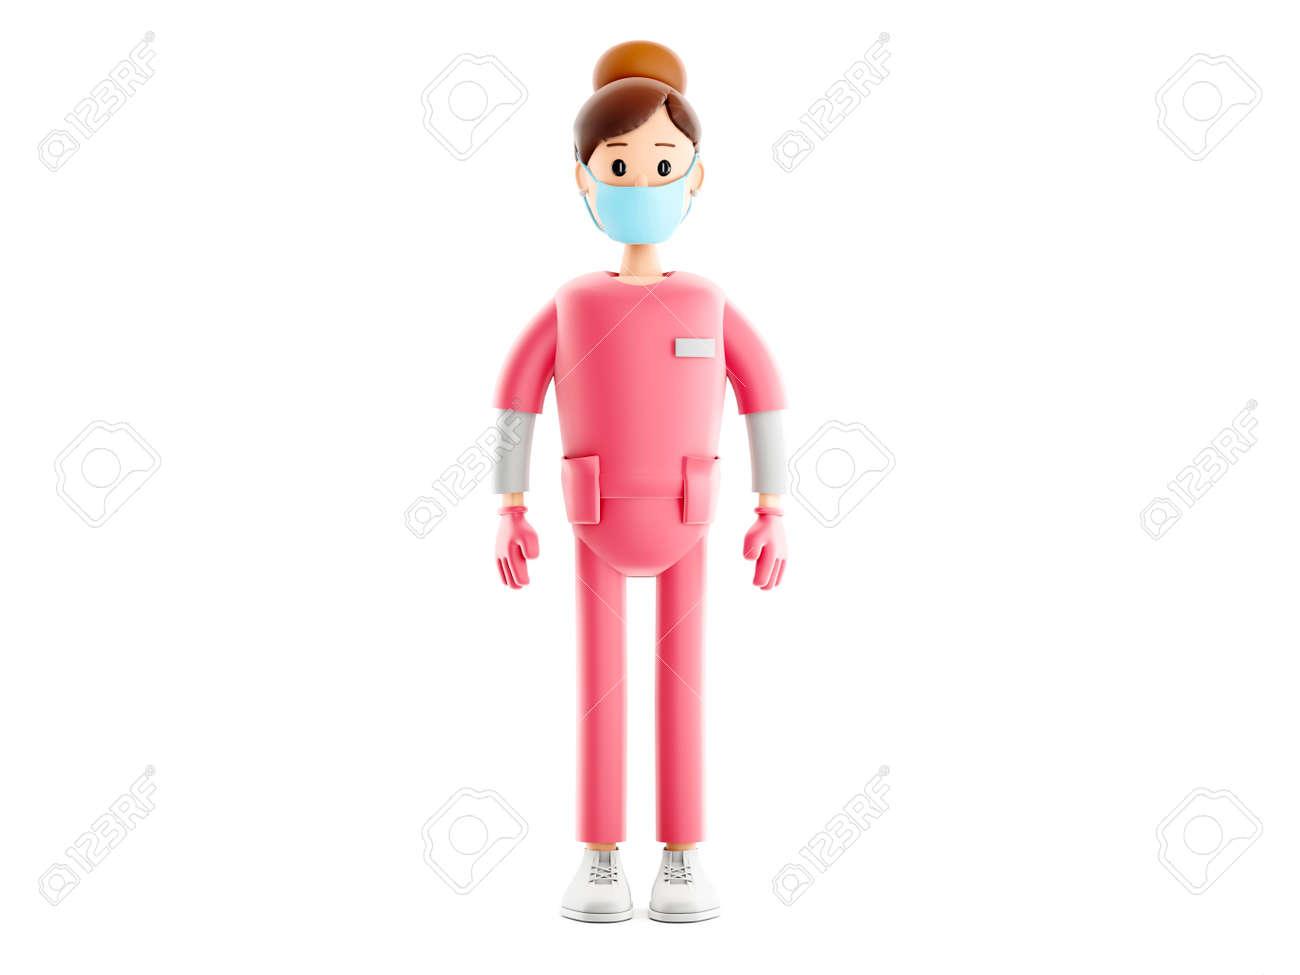 Nurse cartoon guy character. Smiling doctor medical 3d illustration. - 171588092